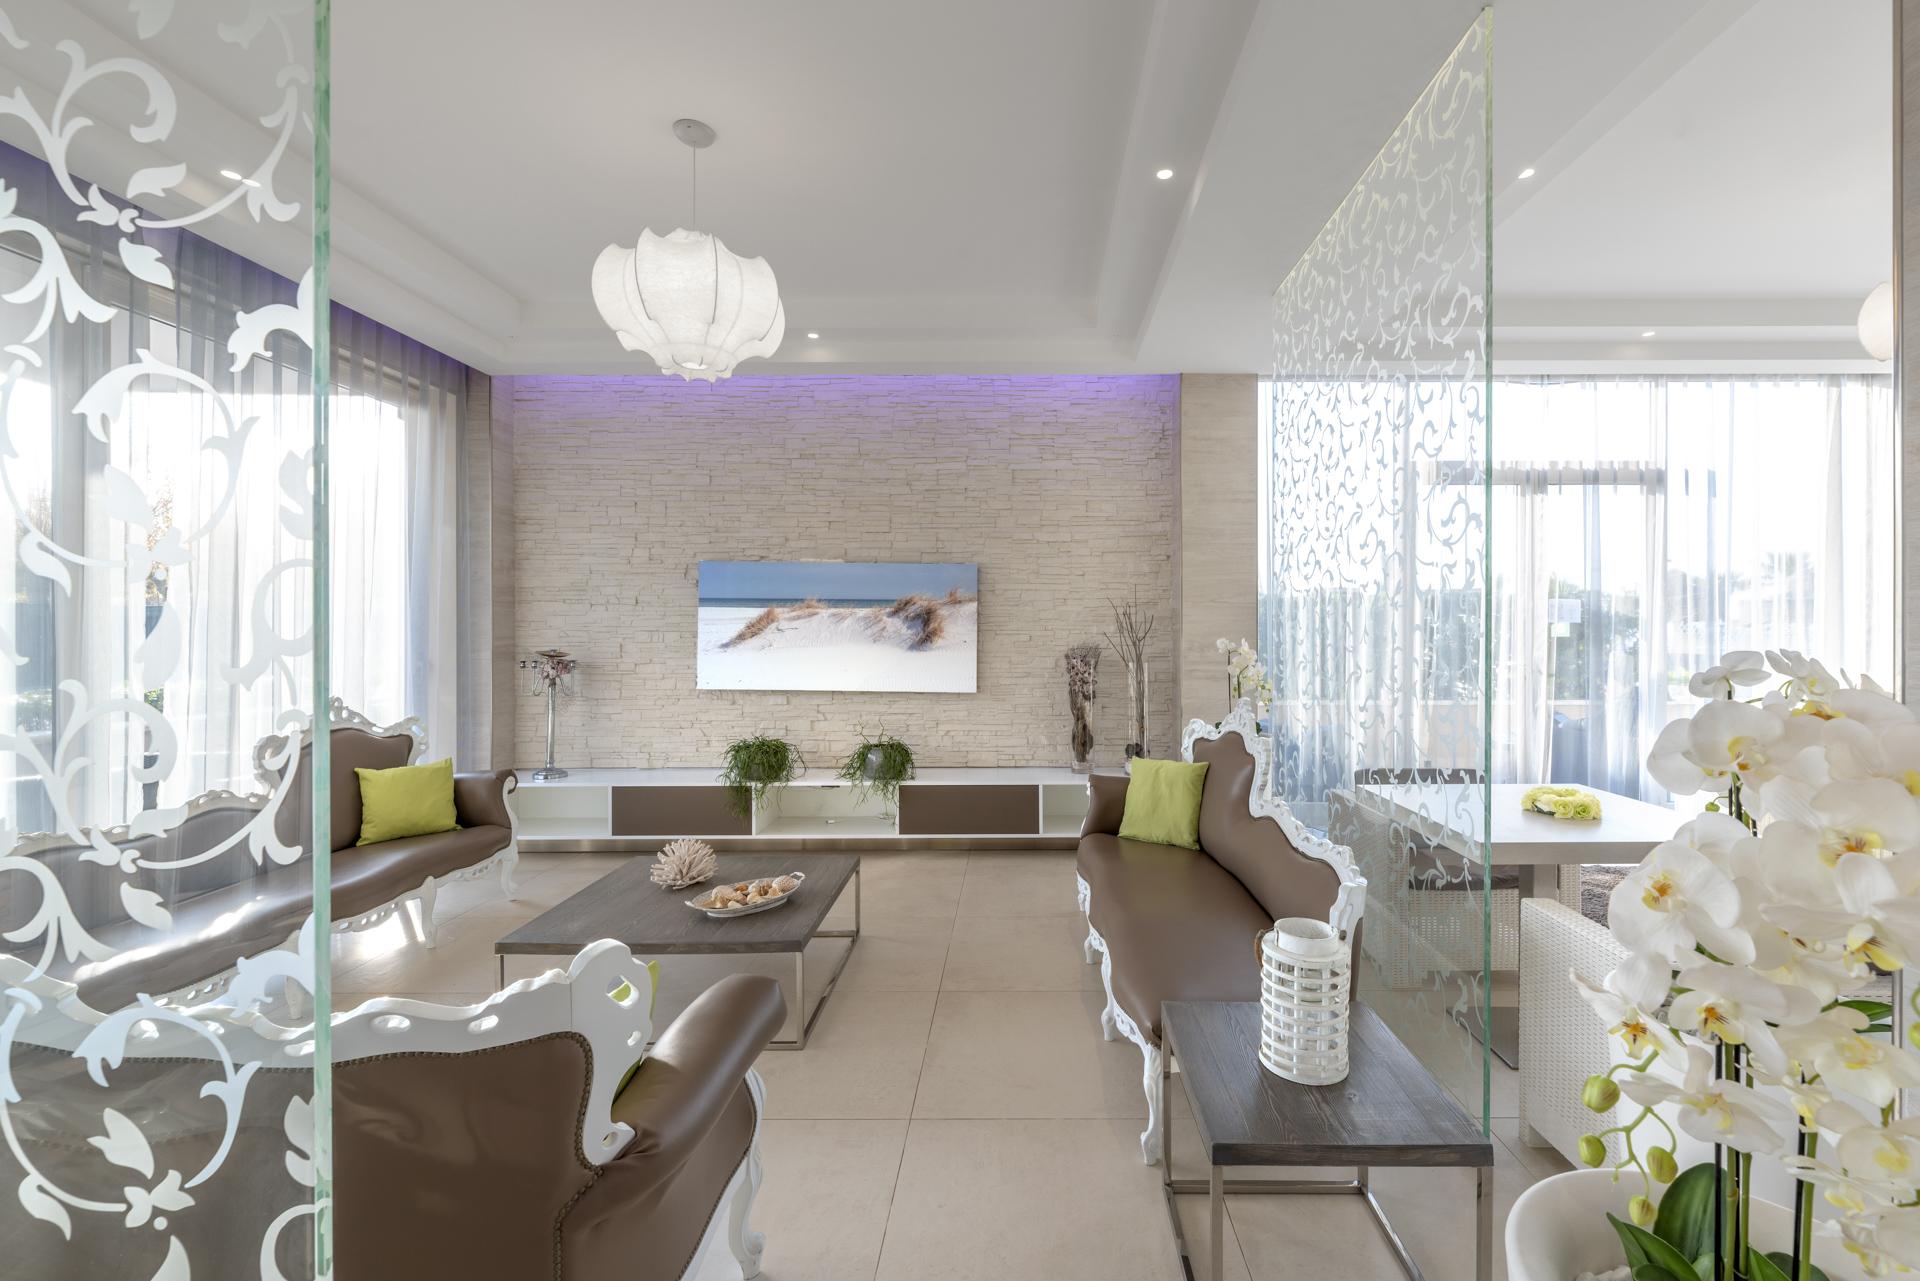 Hotel Liberty, Riccione - Vimar energia positiva